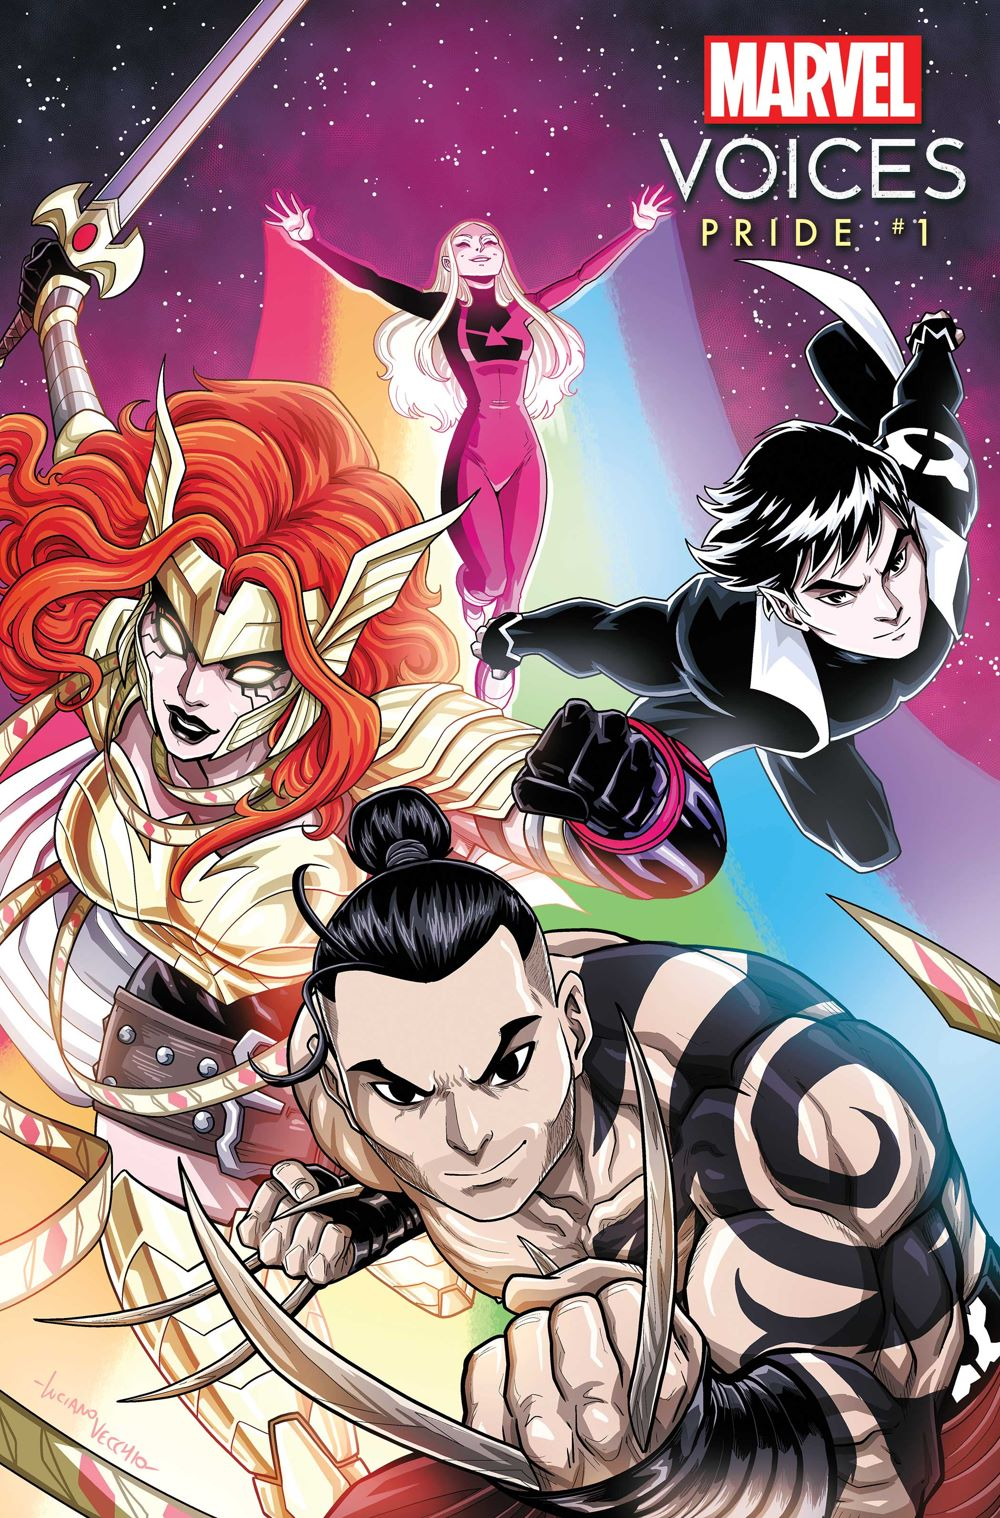 MARVOICESPRIDE2021001_cvr Marvel Comics June 2021 Solicitations